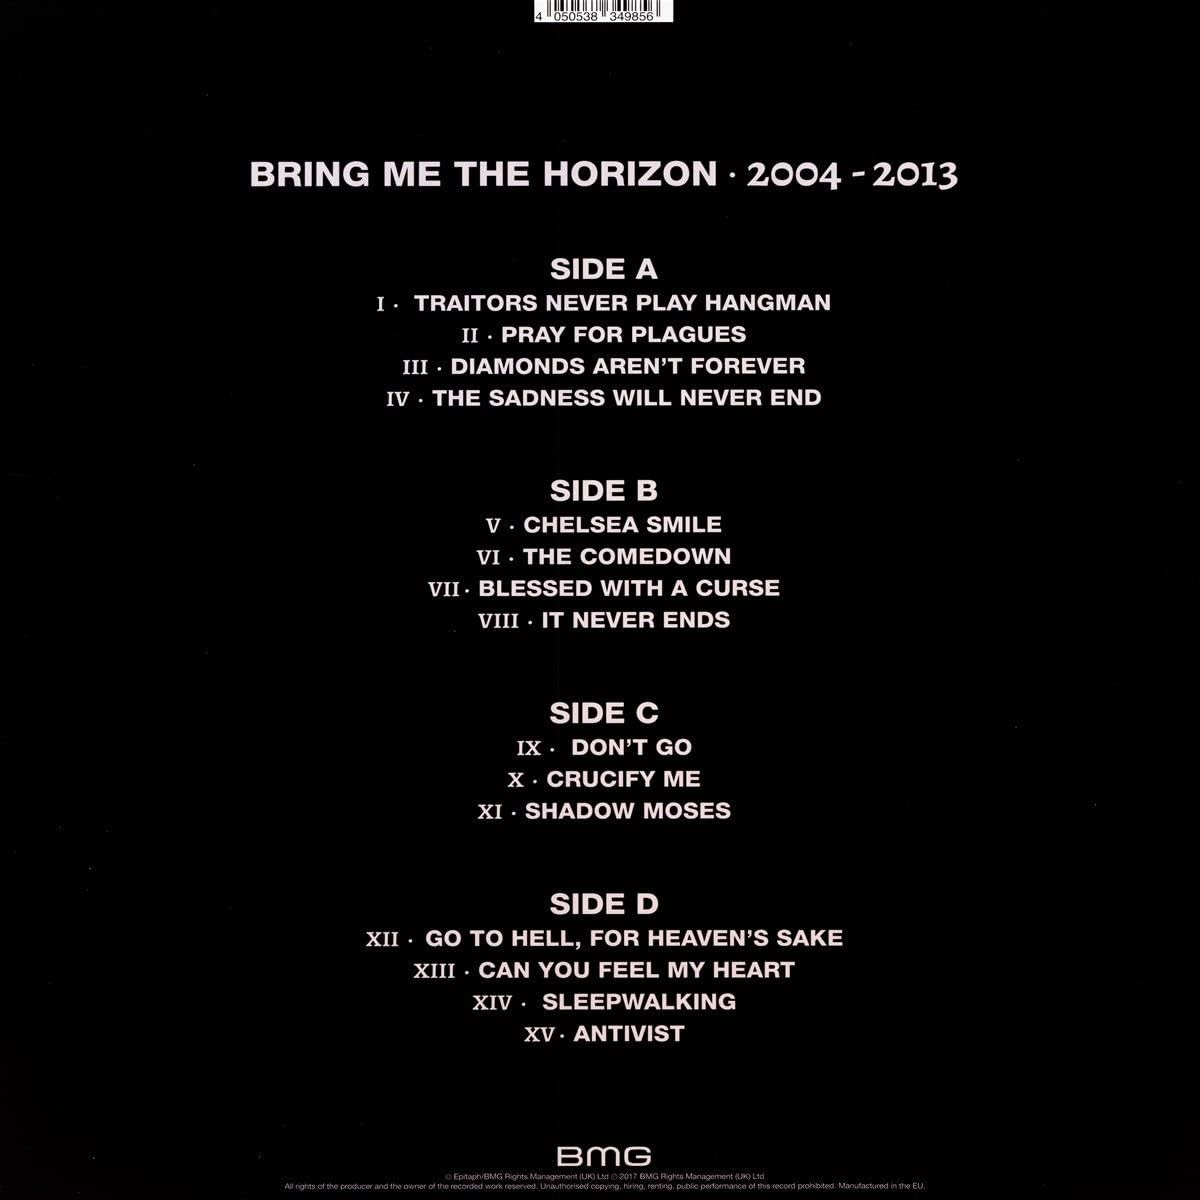 Bring Me The Horizon – 2004-2013